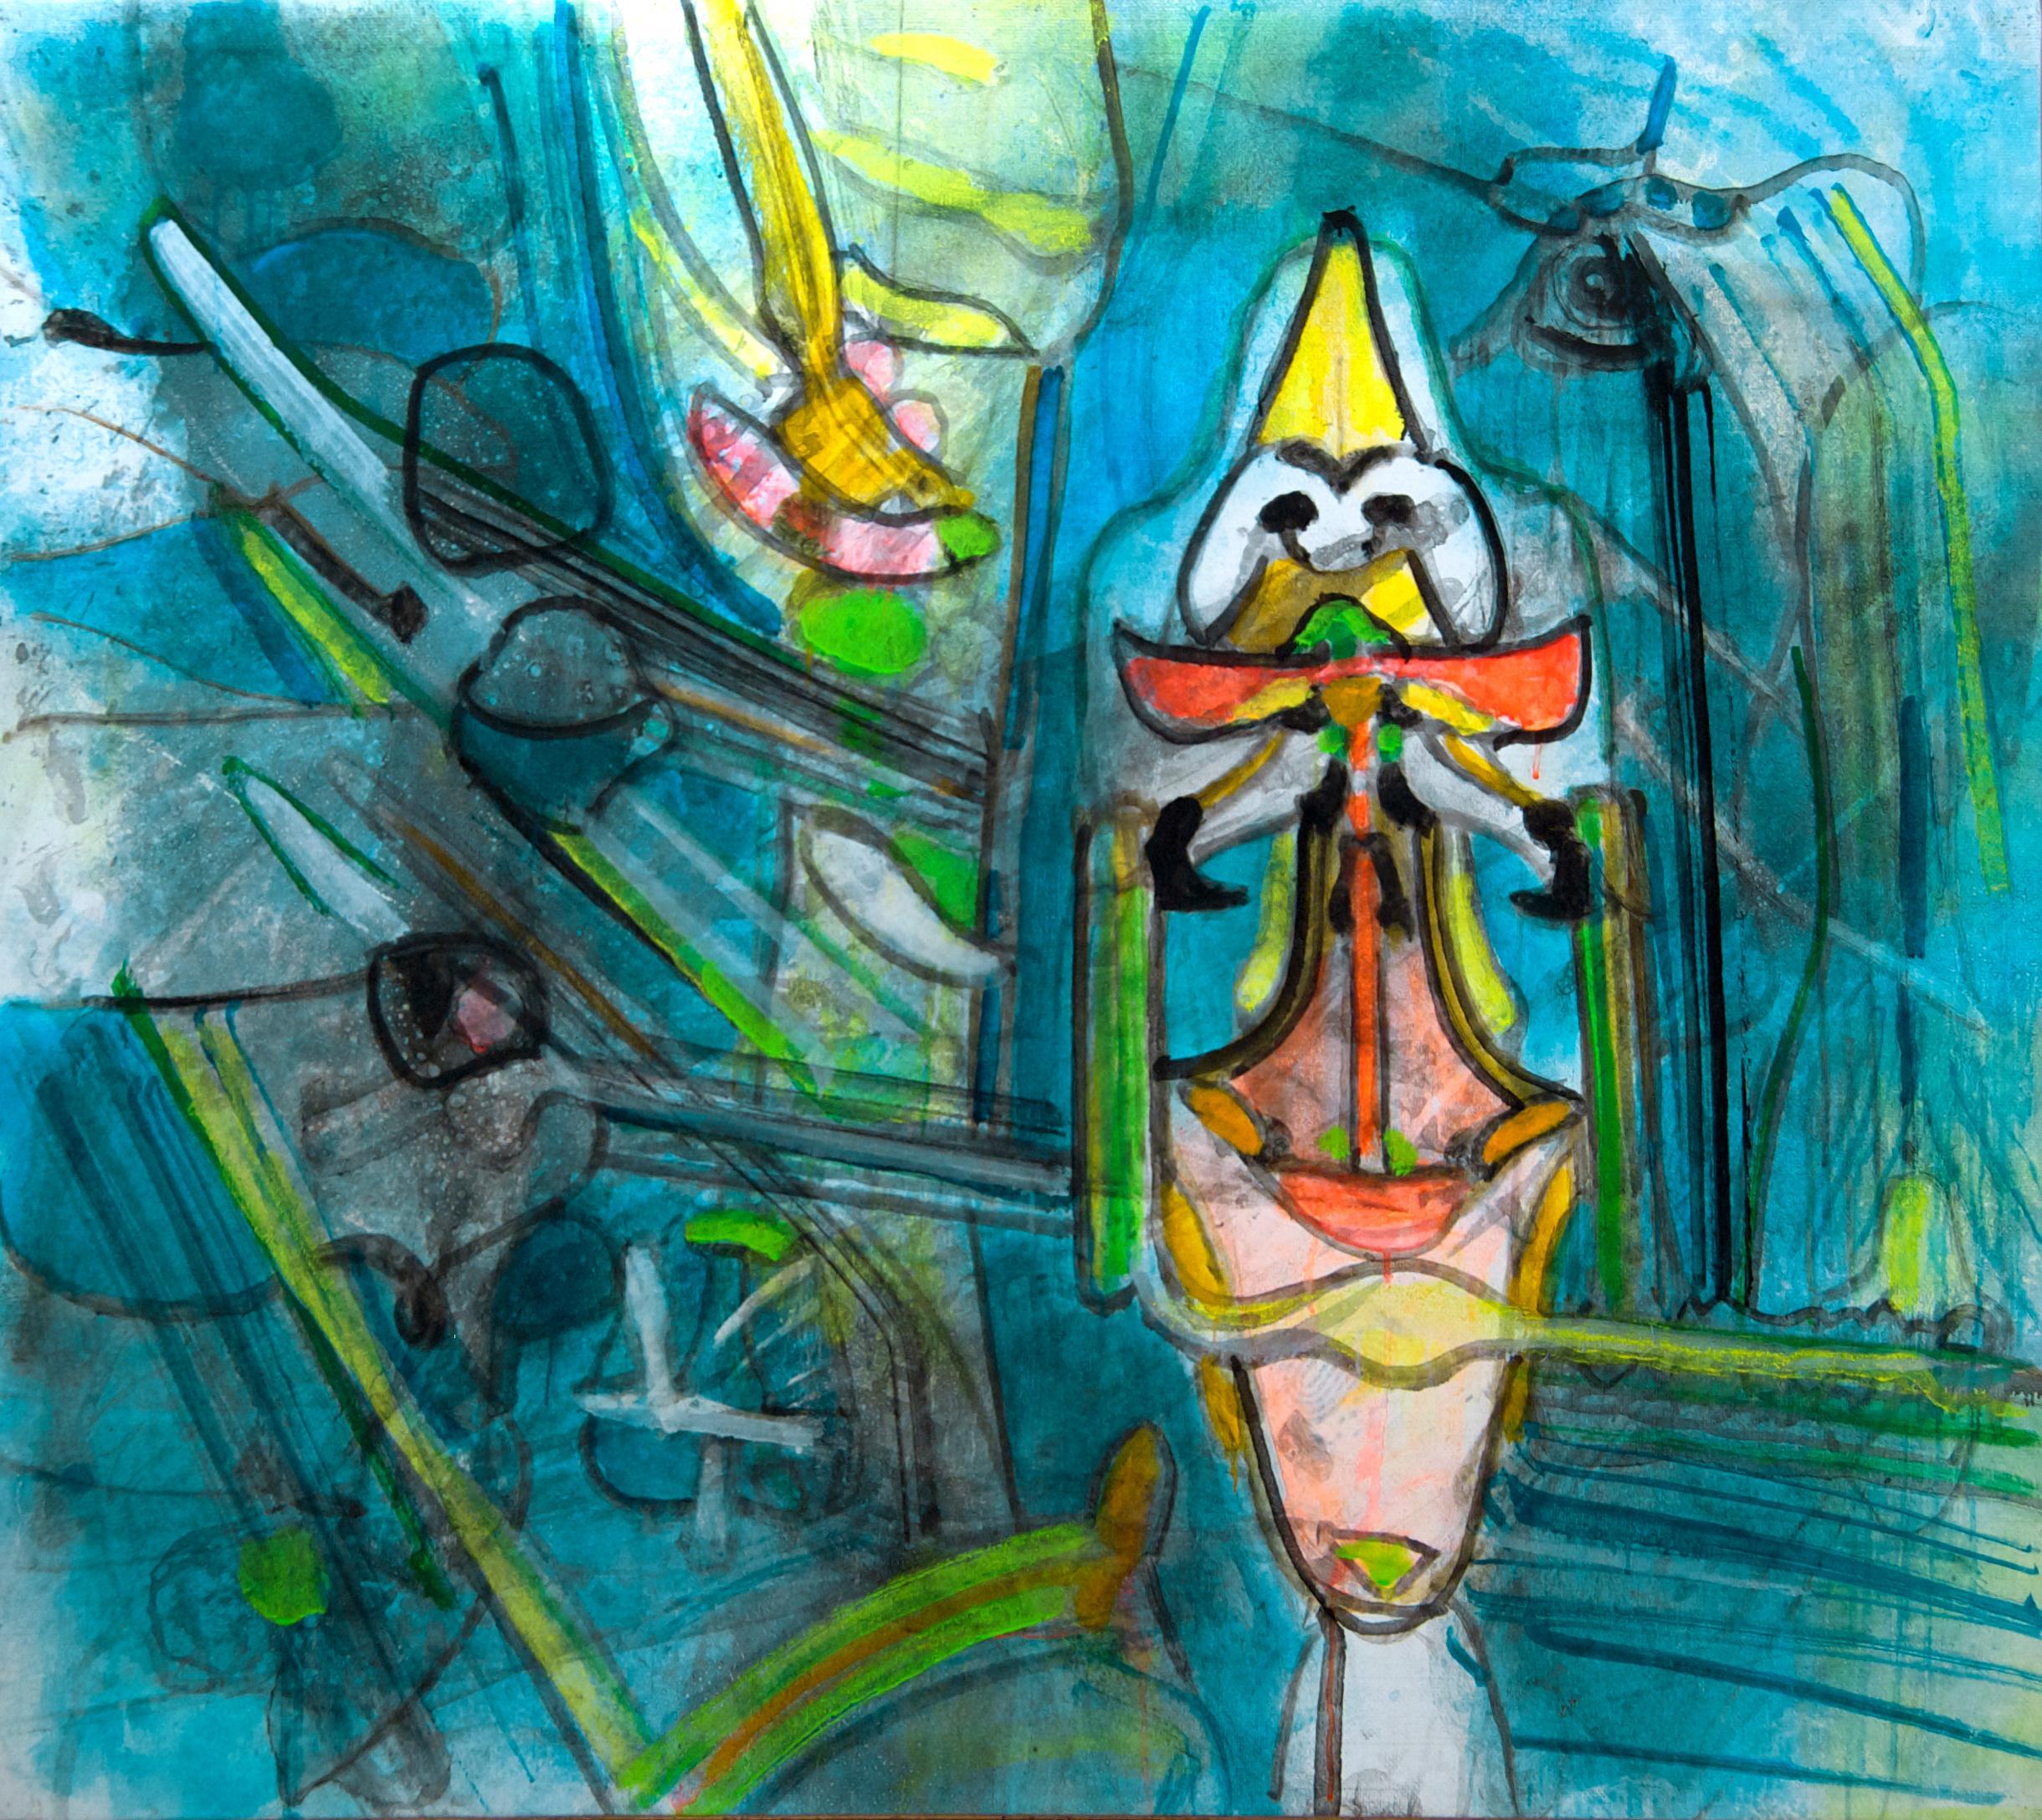 Untitled - Oil on Canvas by Roberto Sebastian Matta - 1996